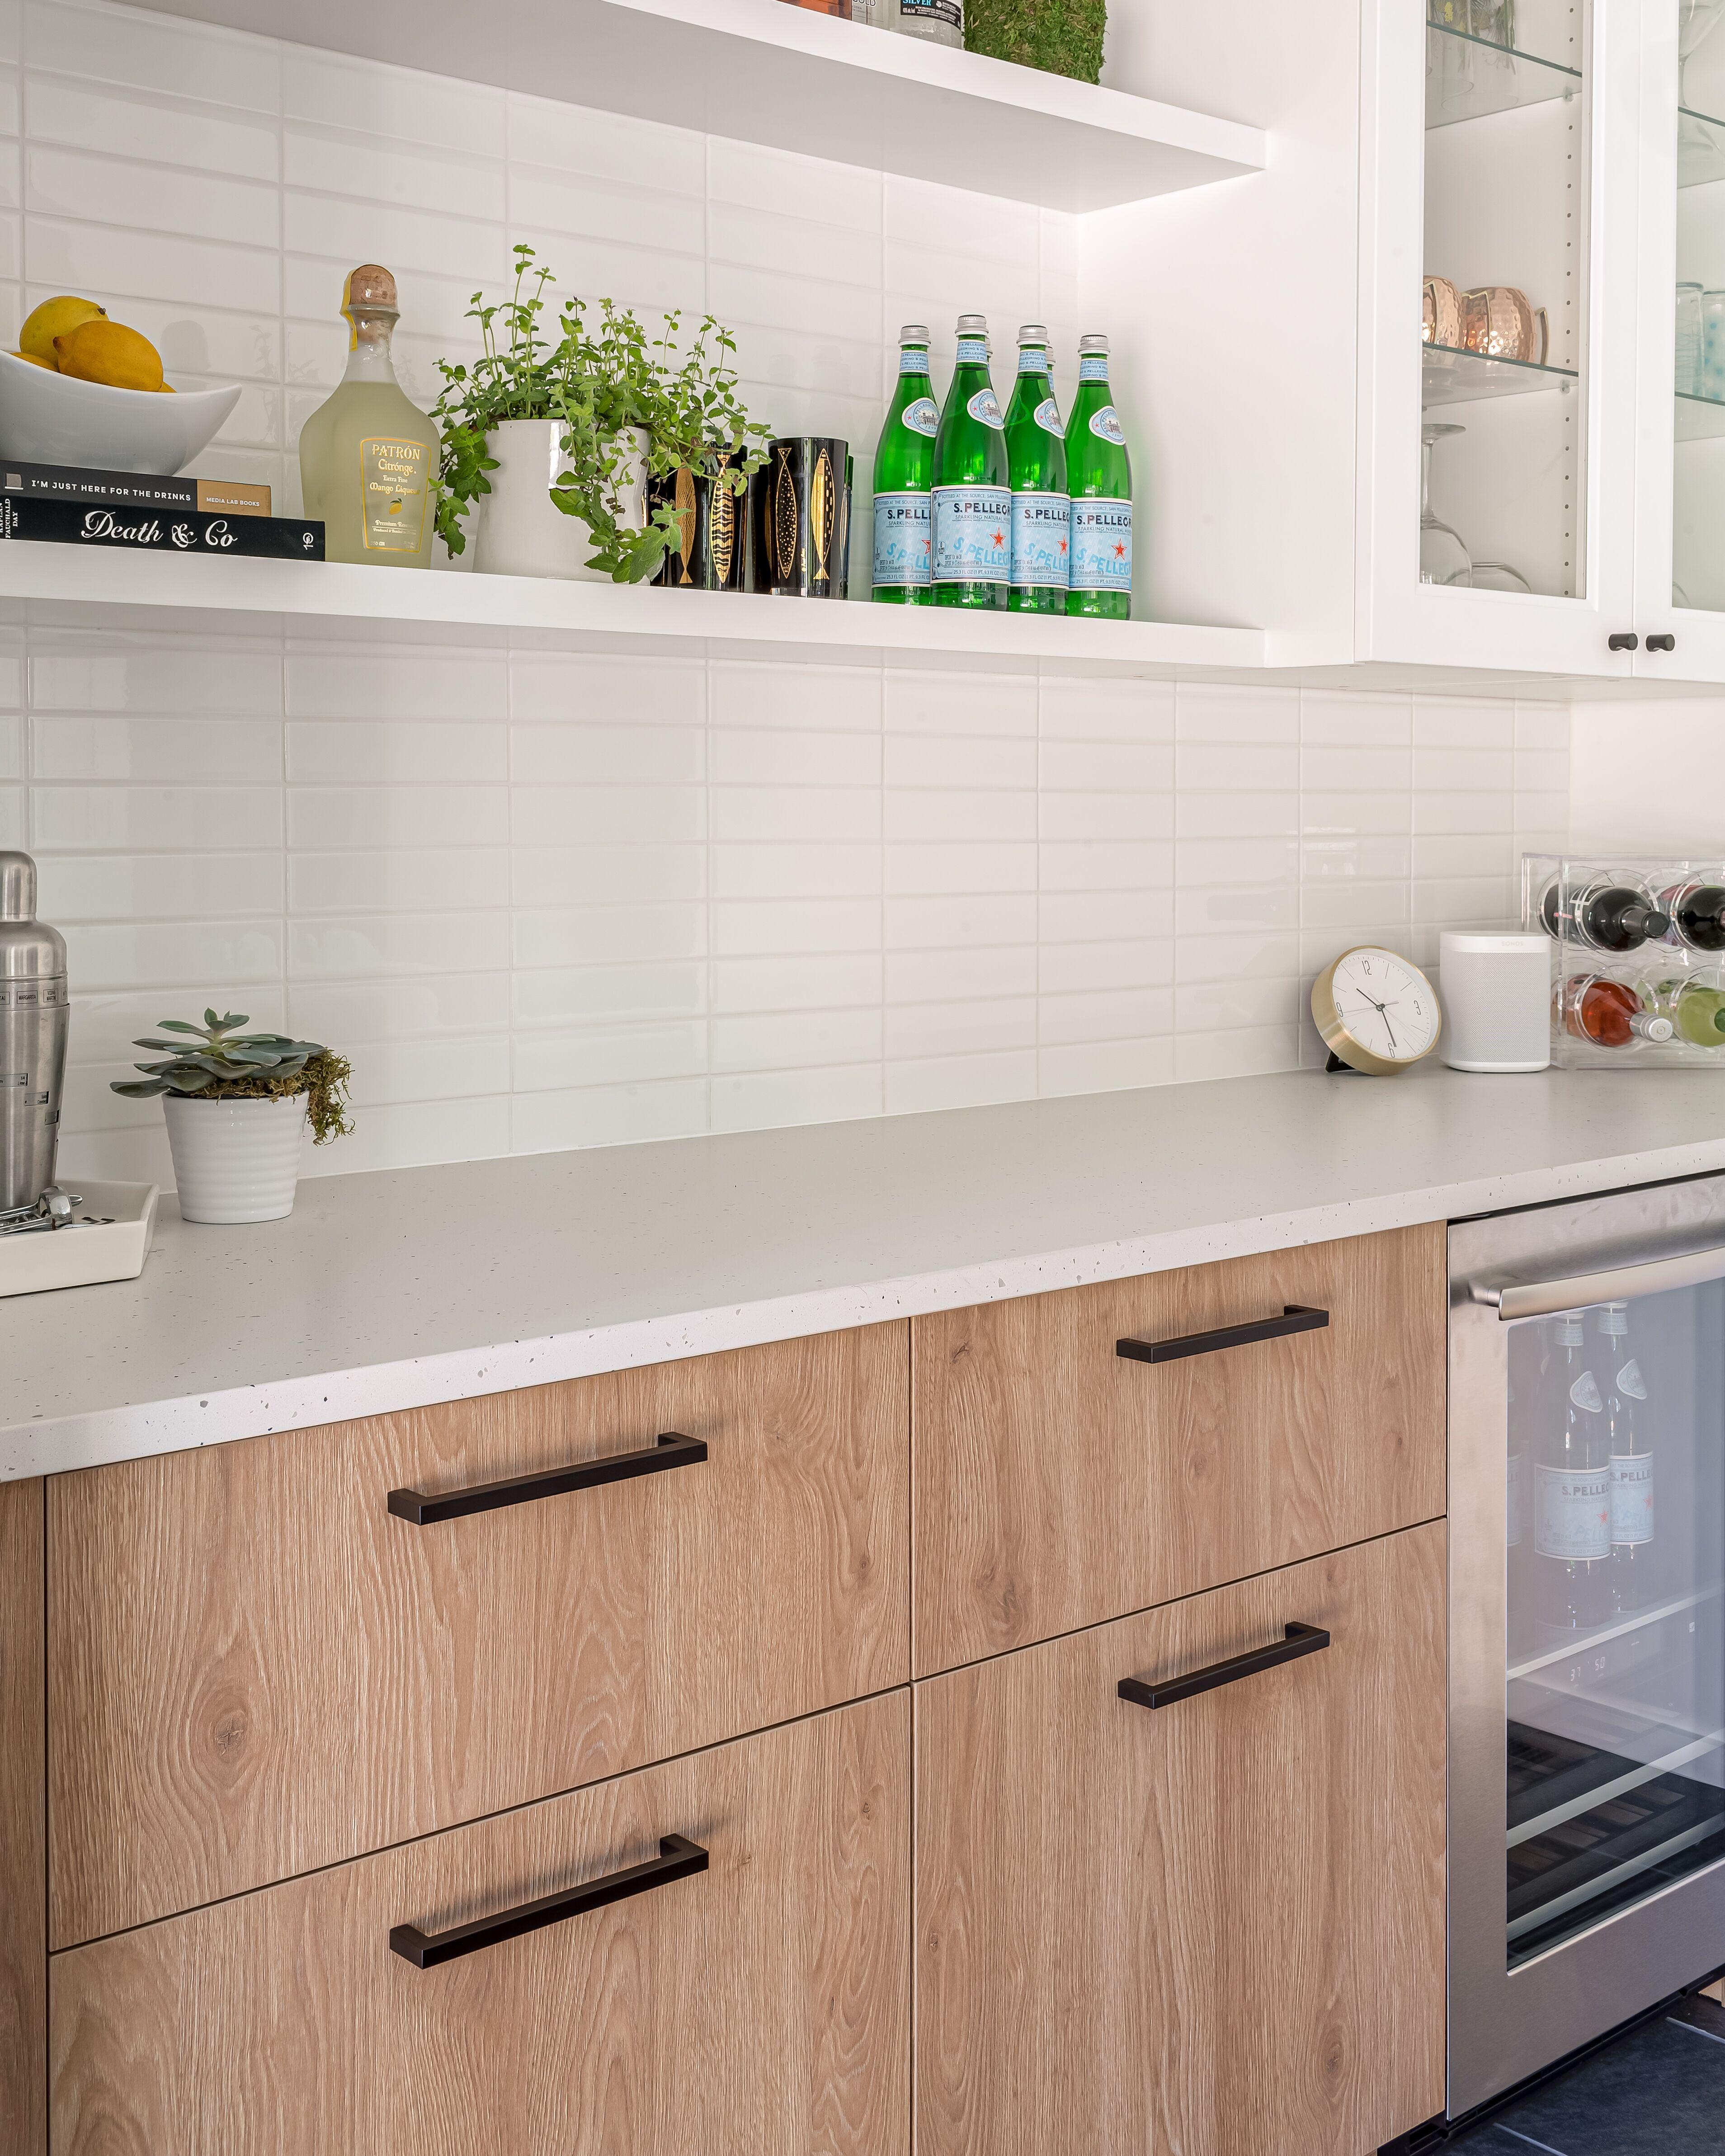 Semihandmade Tahoe Impression Doors For Ikea Kitchen Cabinets Diy Kitchen Cabinets Scandinavian Kitchen Cabinets Kitchen Cabinets Kitchen Cabinet Design